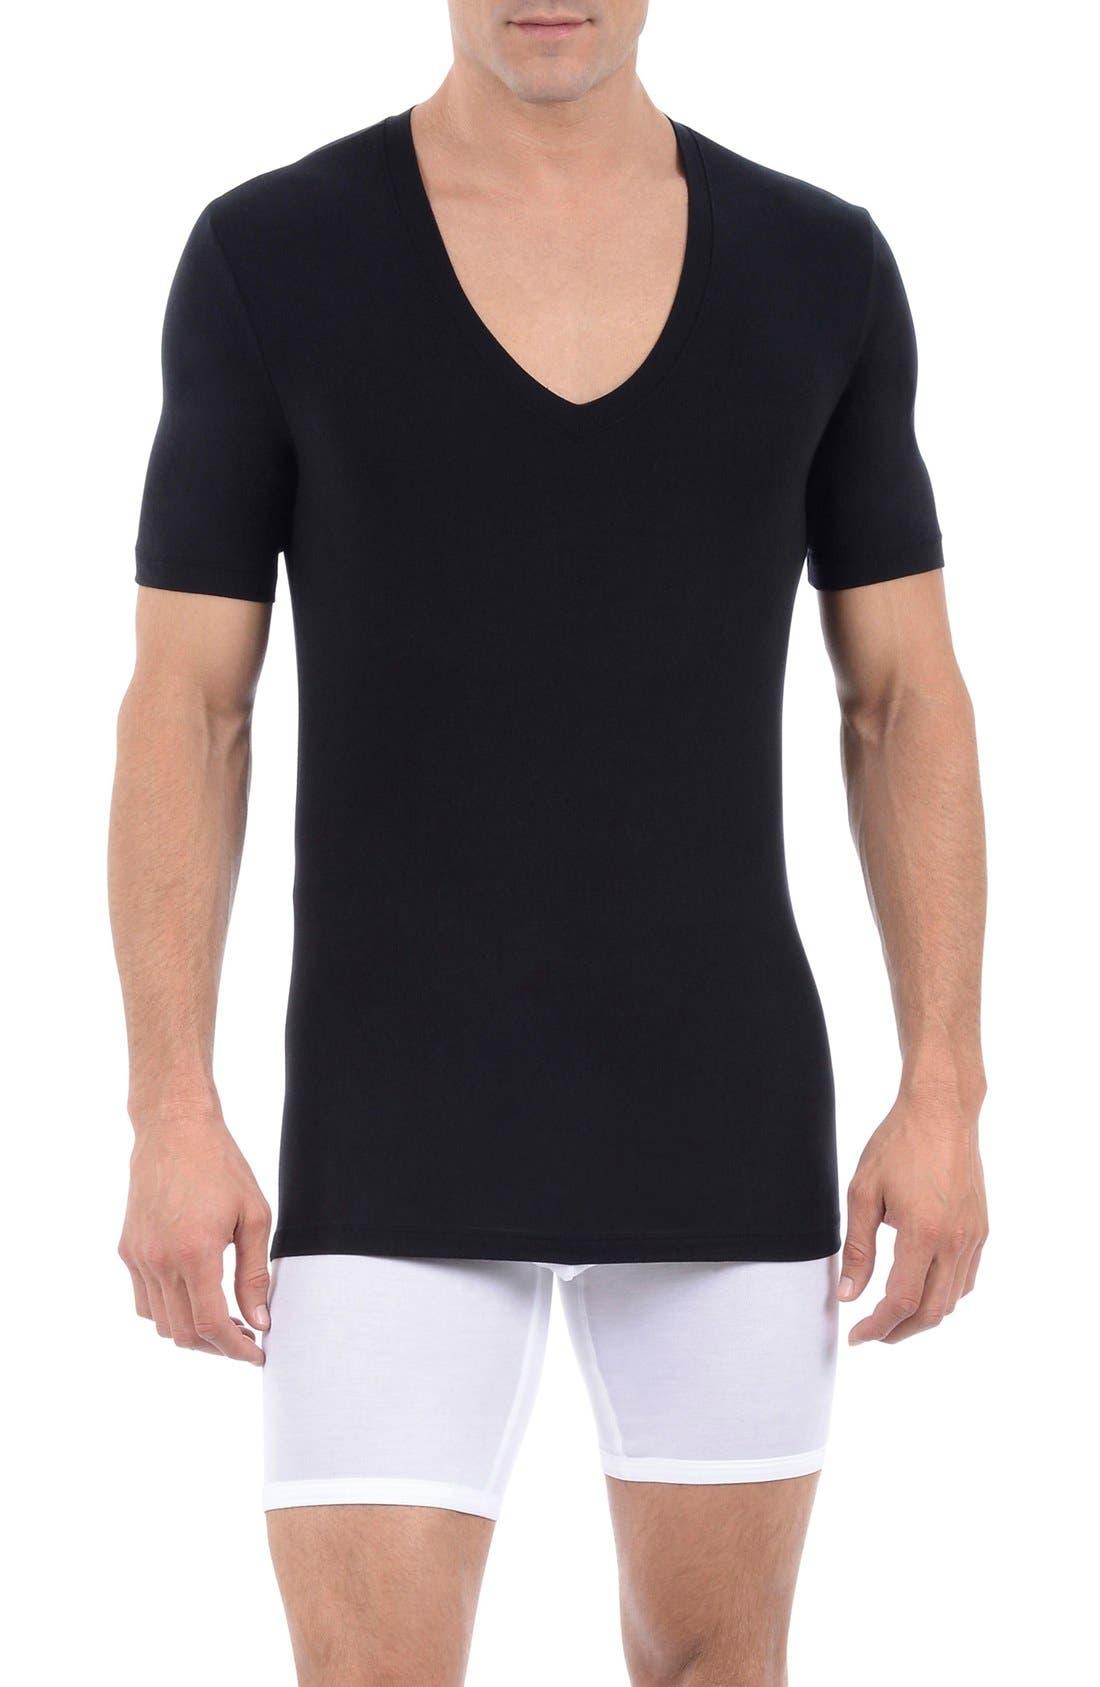 Alternate Image 1 Selected - Tommy John 'Cool Cotton' Deep V-Neck Undershirt